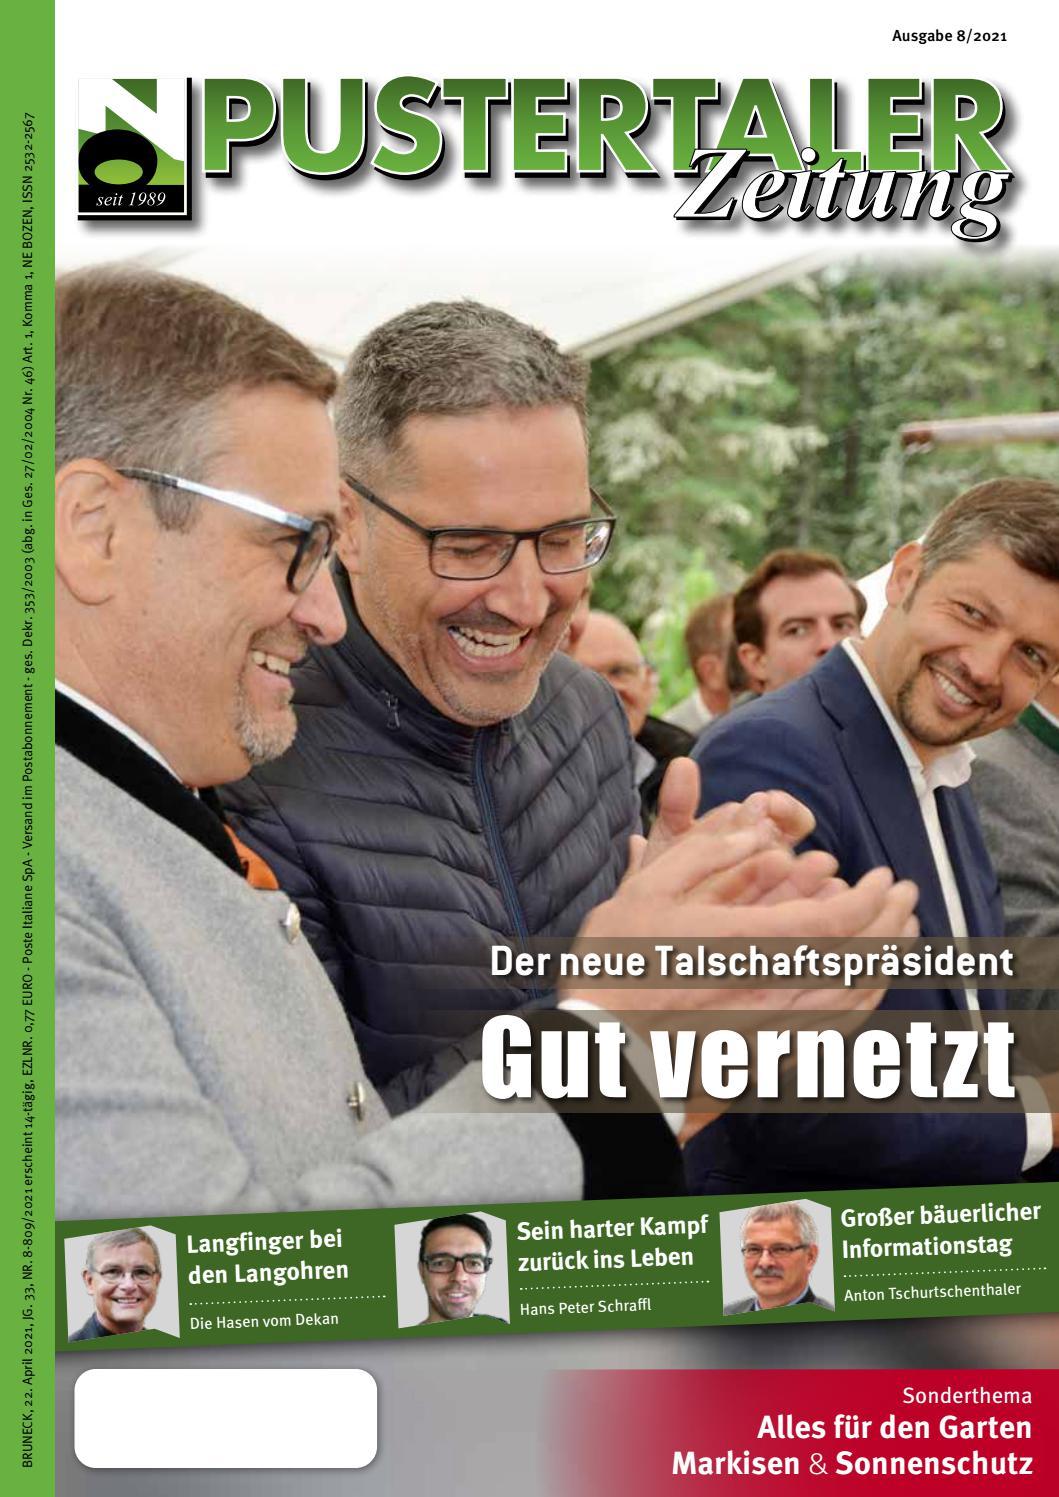 Partnersuche Südtirol, ~~~ Erotik-Kontaktanzeigen ~~~ { eaq4 } - Gravatar Profile